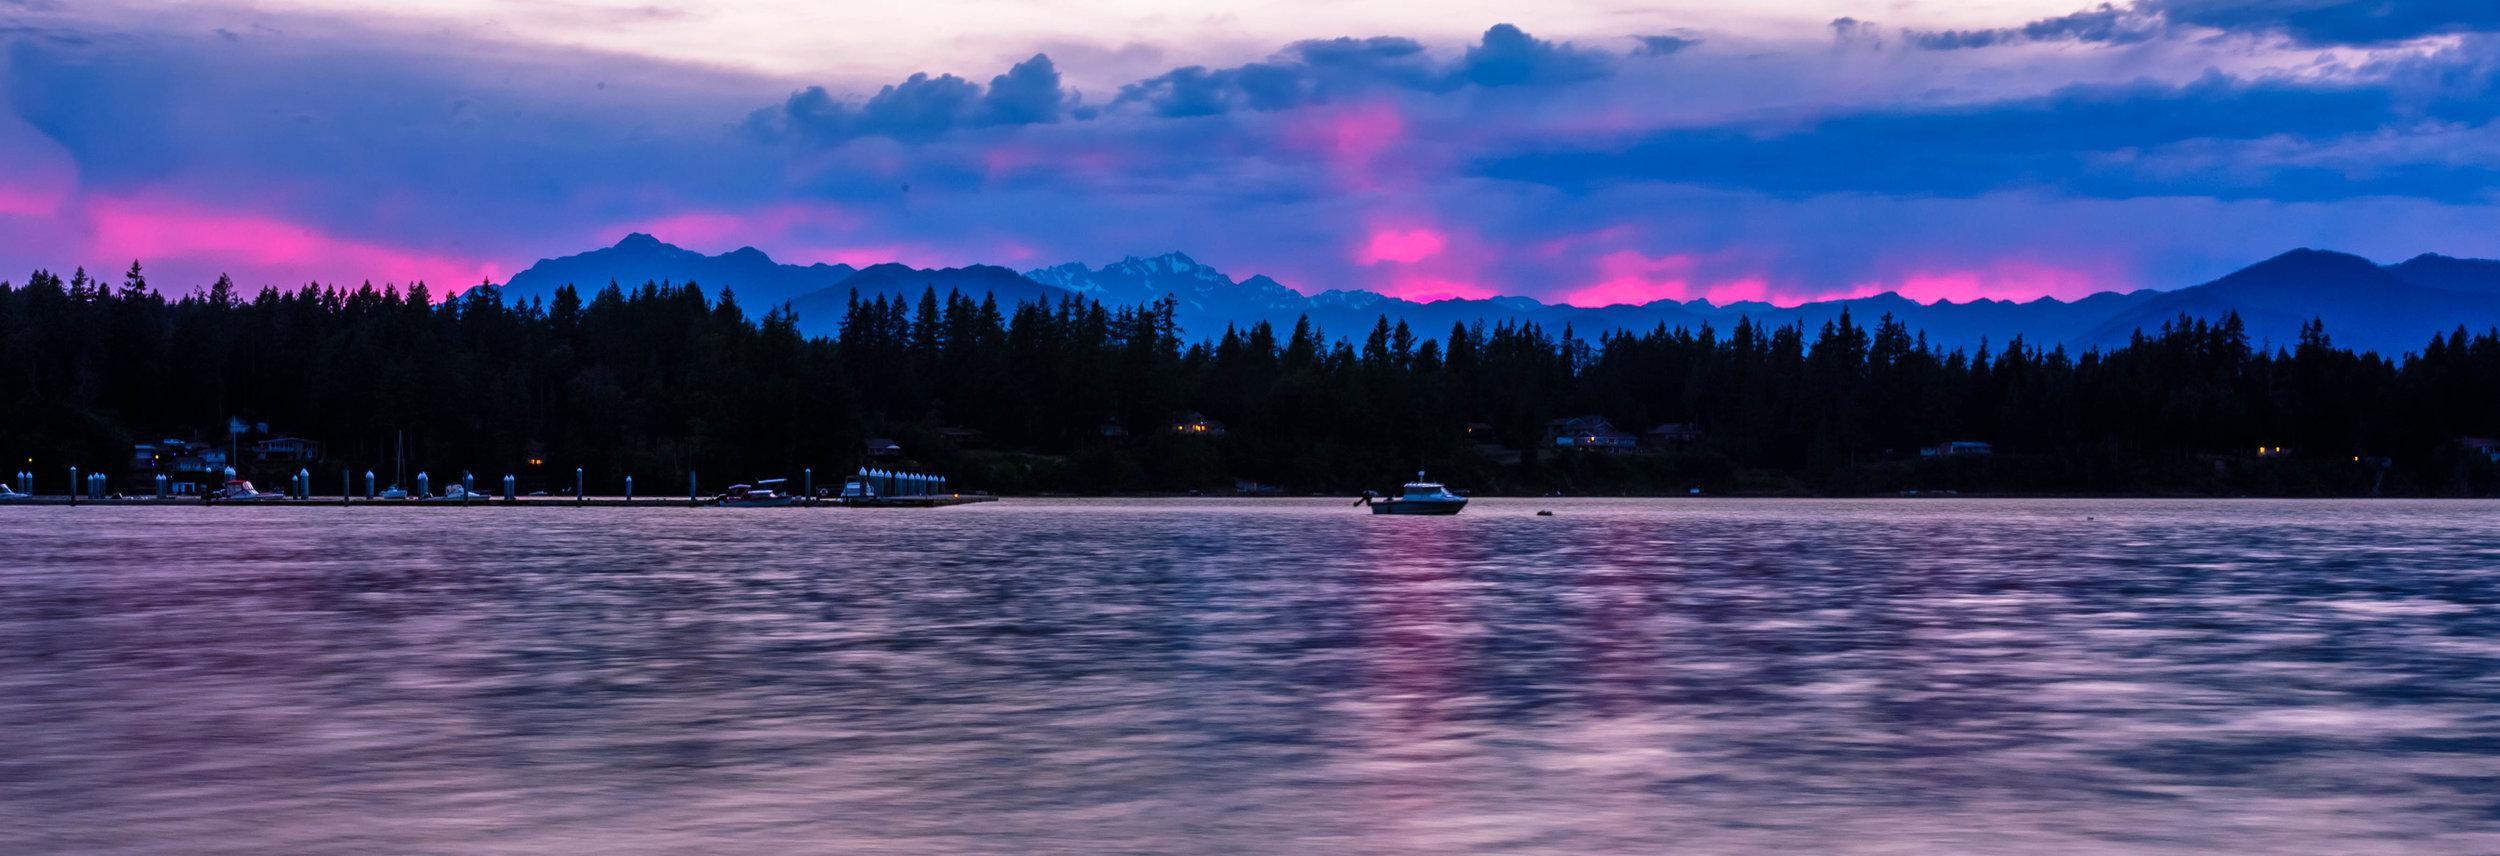 Olympic Mountains, Washington